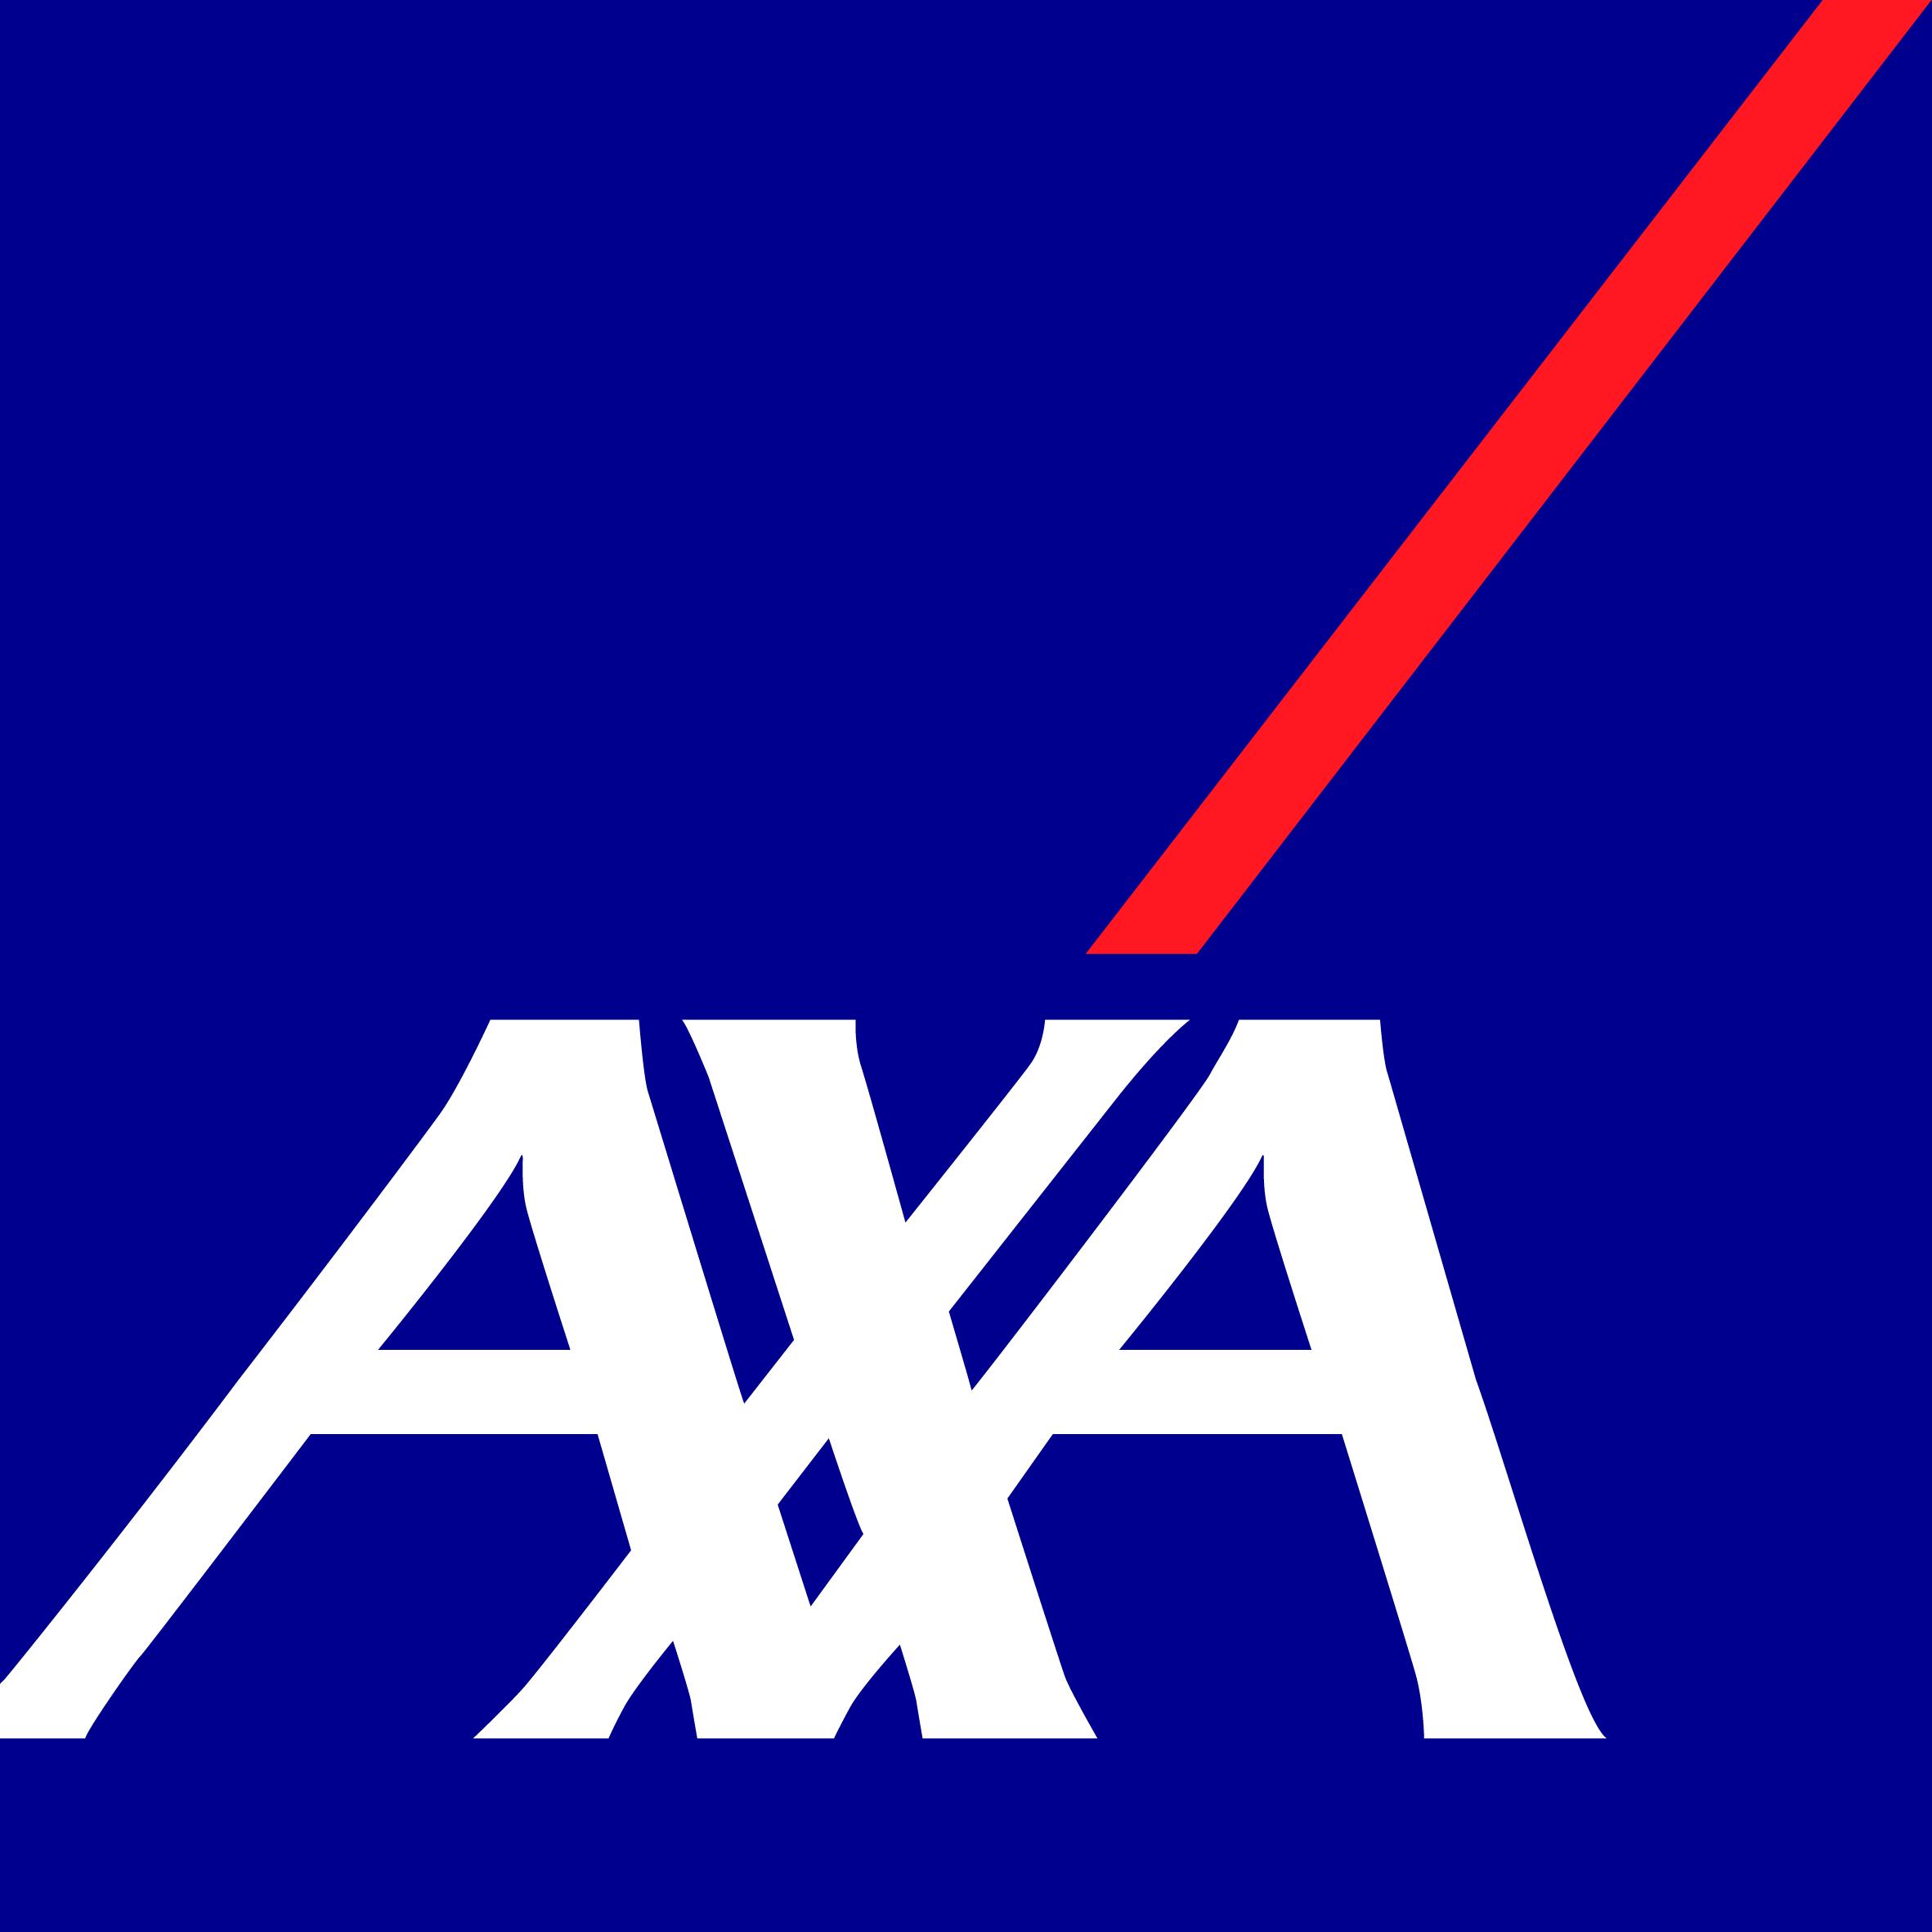 https://ebpevents.be/wp-content/uploads/2019/04/Axa-1.png